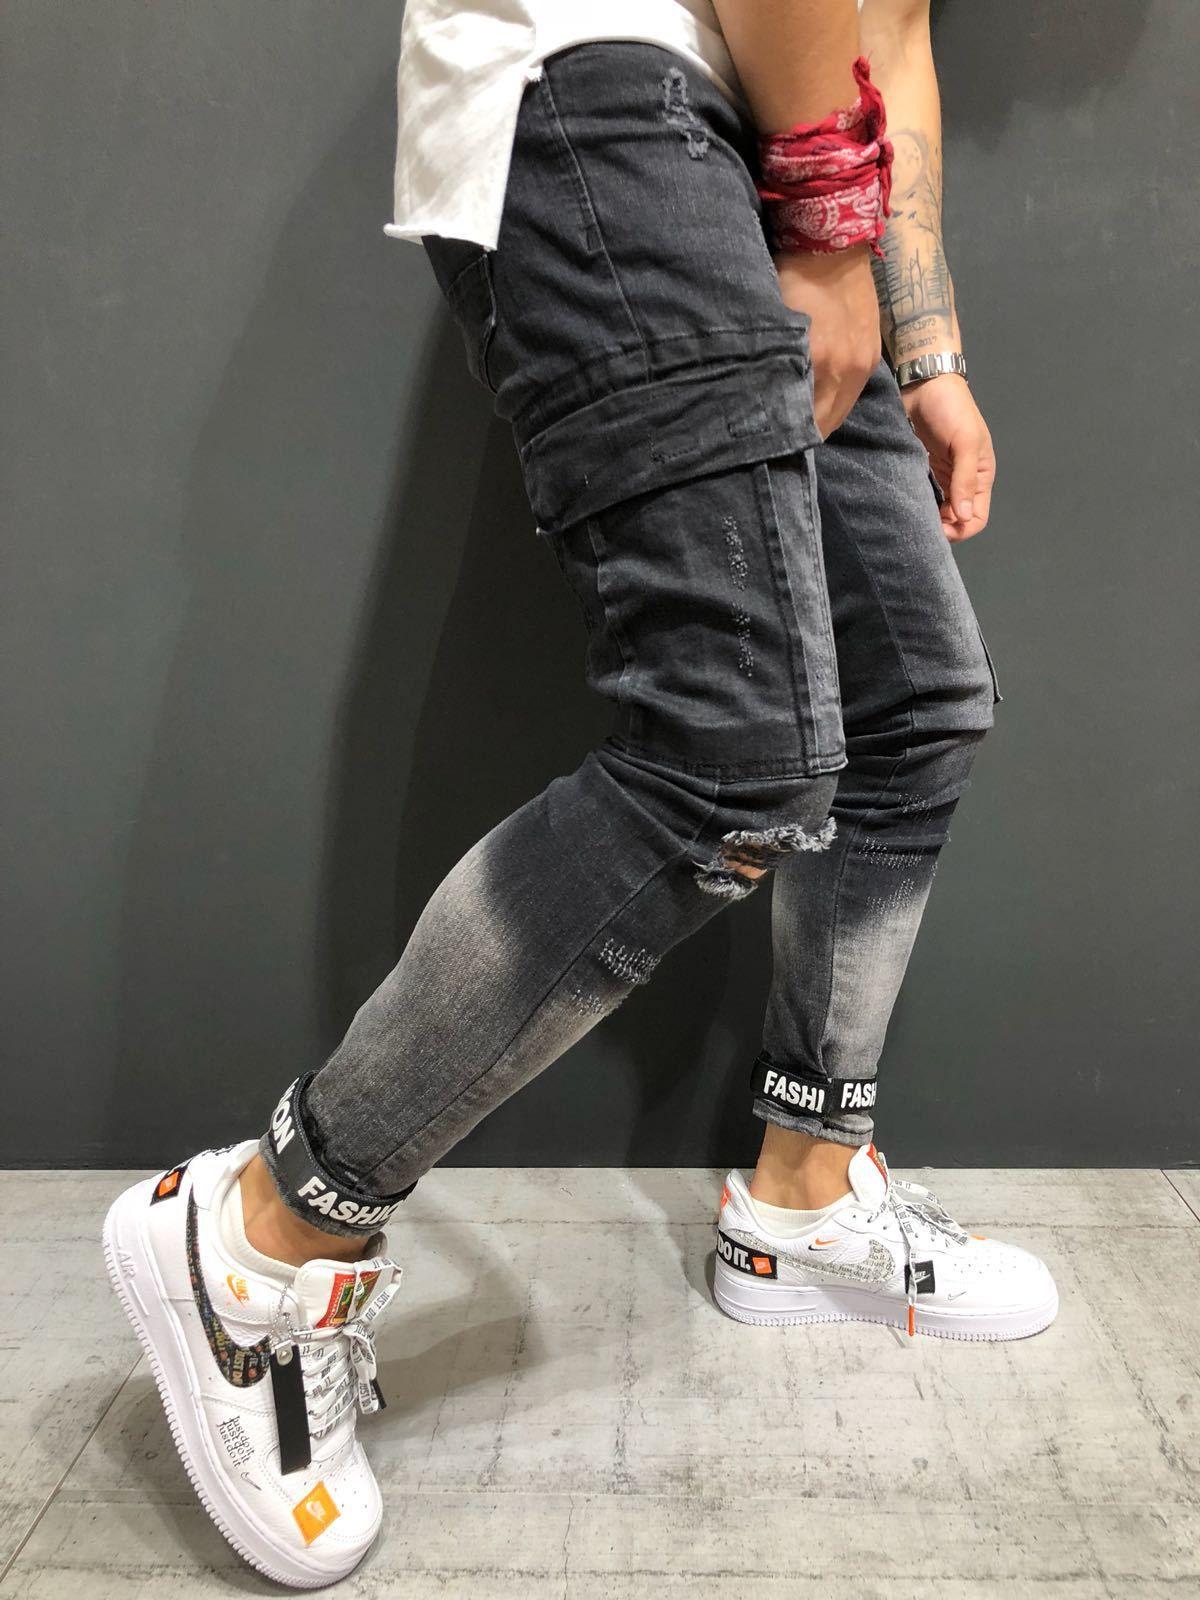 99280e8524 Compre Pantalones Vaqueros De Moda Ropa De Hombre Bolsillos Grandes  Rasgados Pantalones Ajustados Pantalones Largos Pantalones Largos A  47.77  Del ...